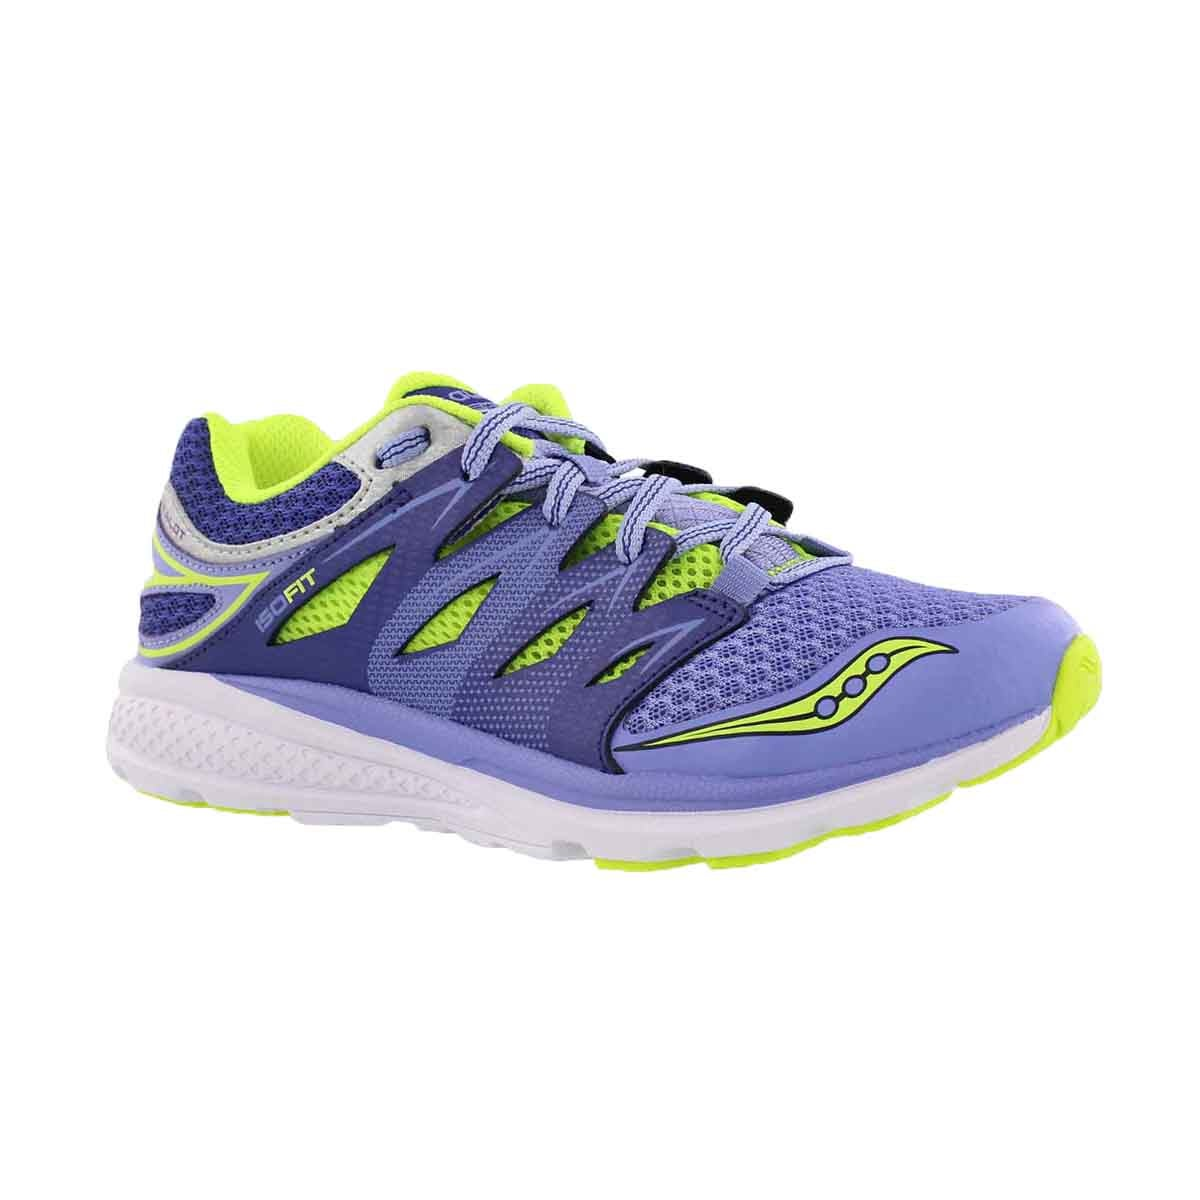 Grls Zealot 2 ppl/blu running shoe